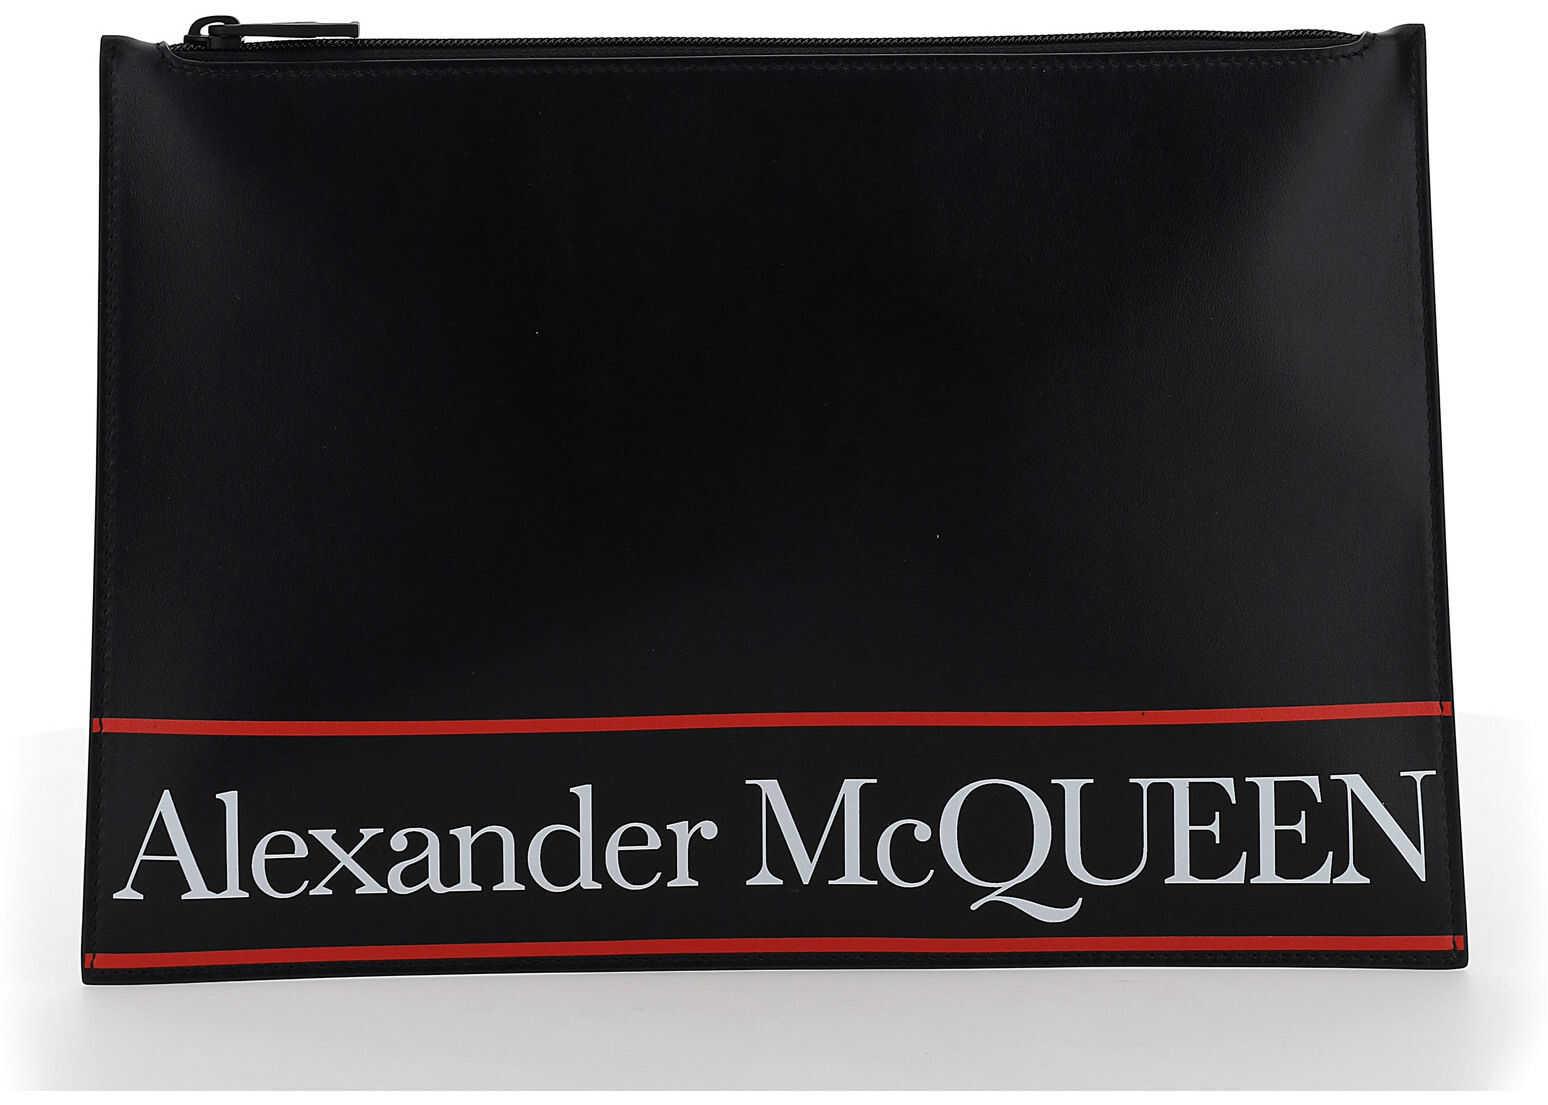 Alexander McQueen Pouch 5604721SJ6B BLACK/RED imagine b-mall.ro